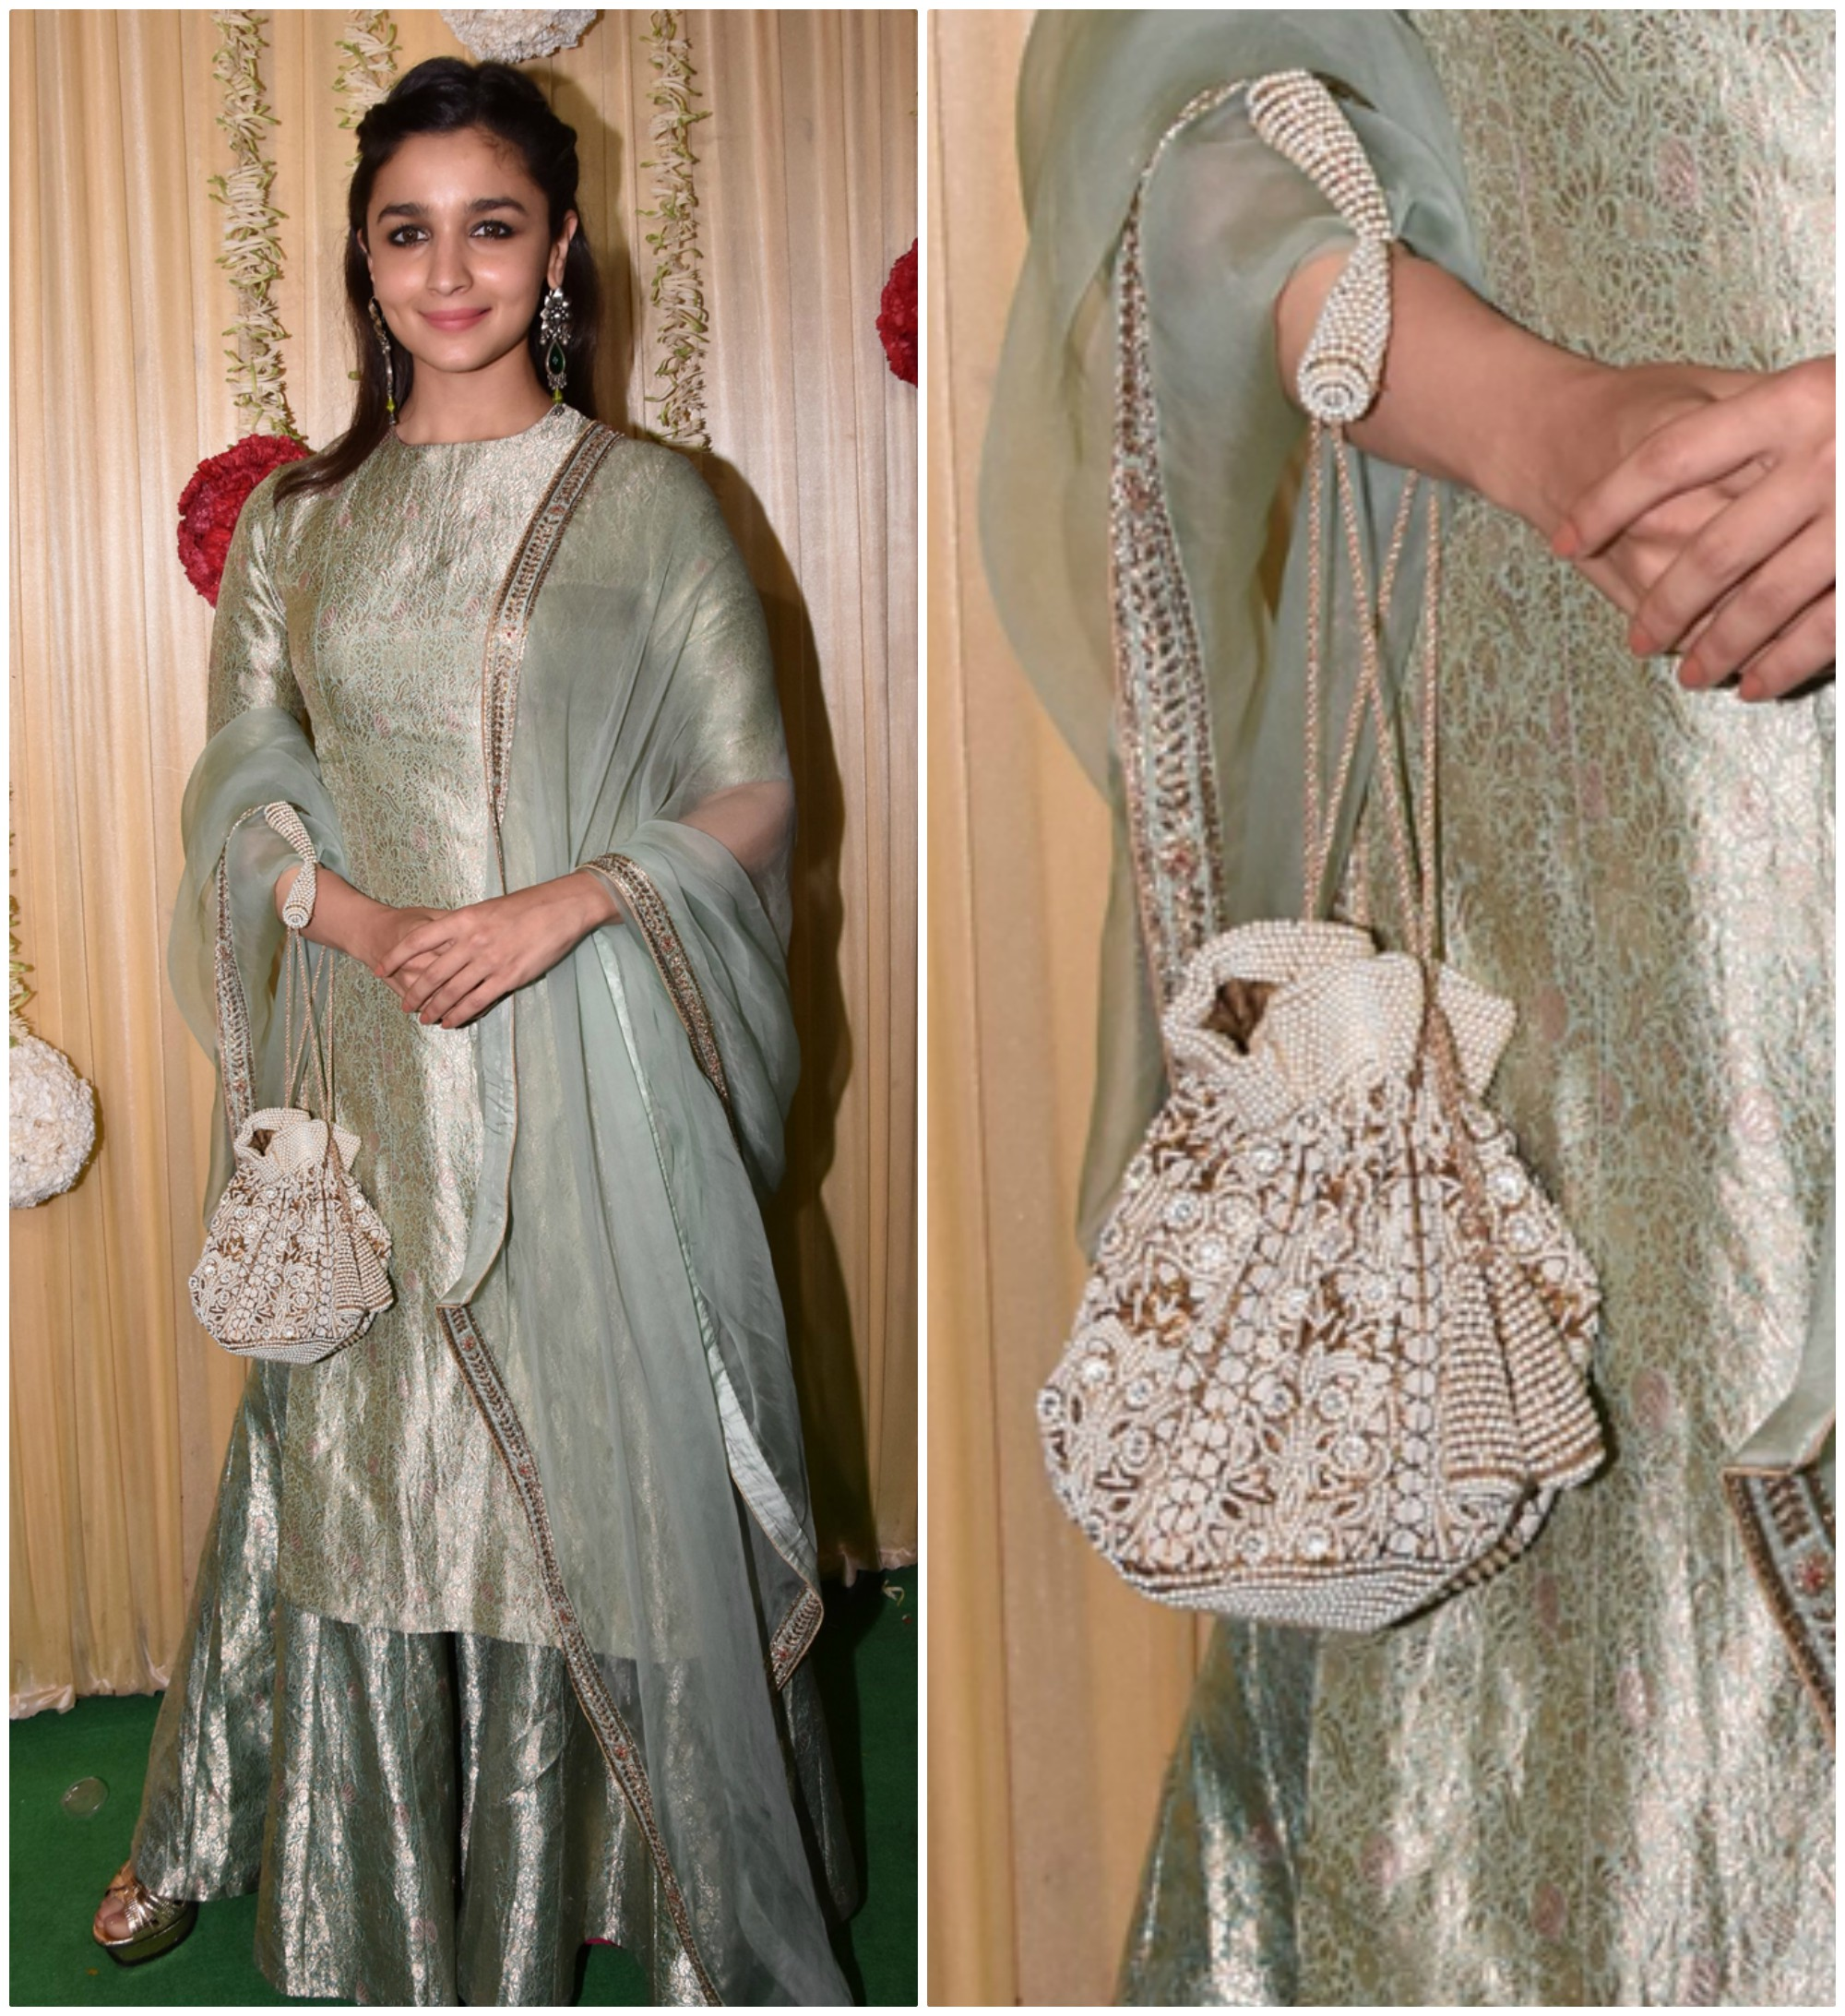 PunjabKesari, Latkan Style Polti Bag Design Image, लटकन स्टाइल पोटली बैग डिज़ाइन इमेज